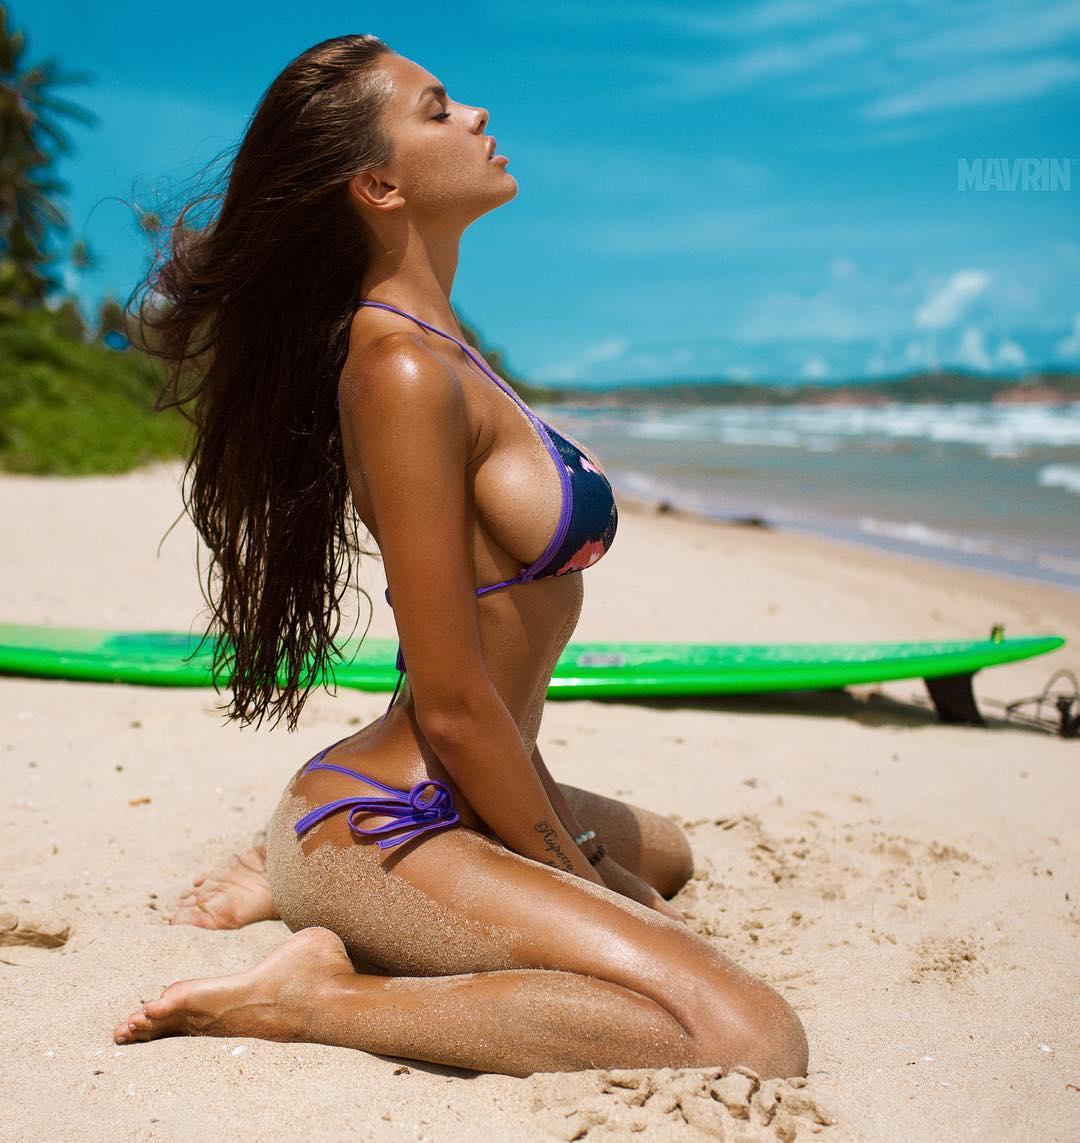 Viktoria Odintsova in a bikini